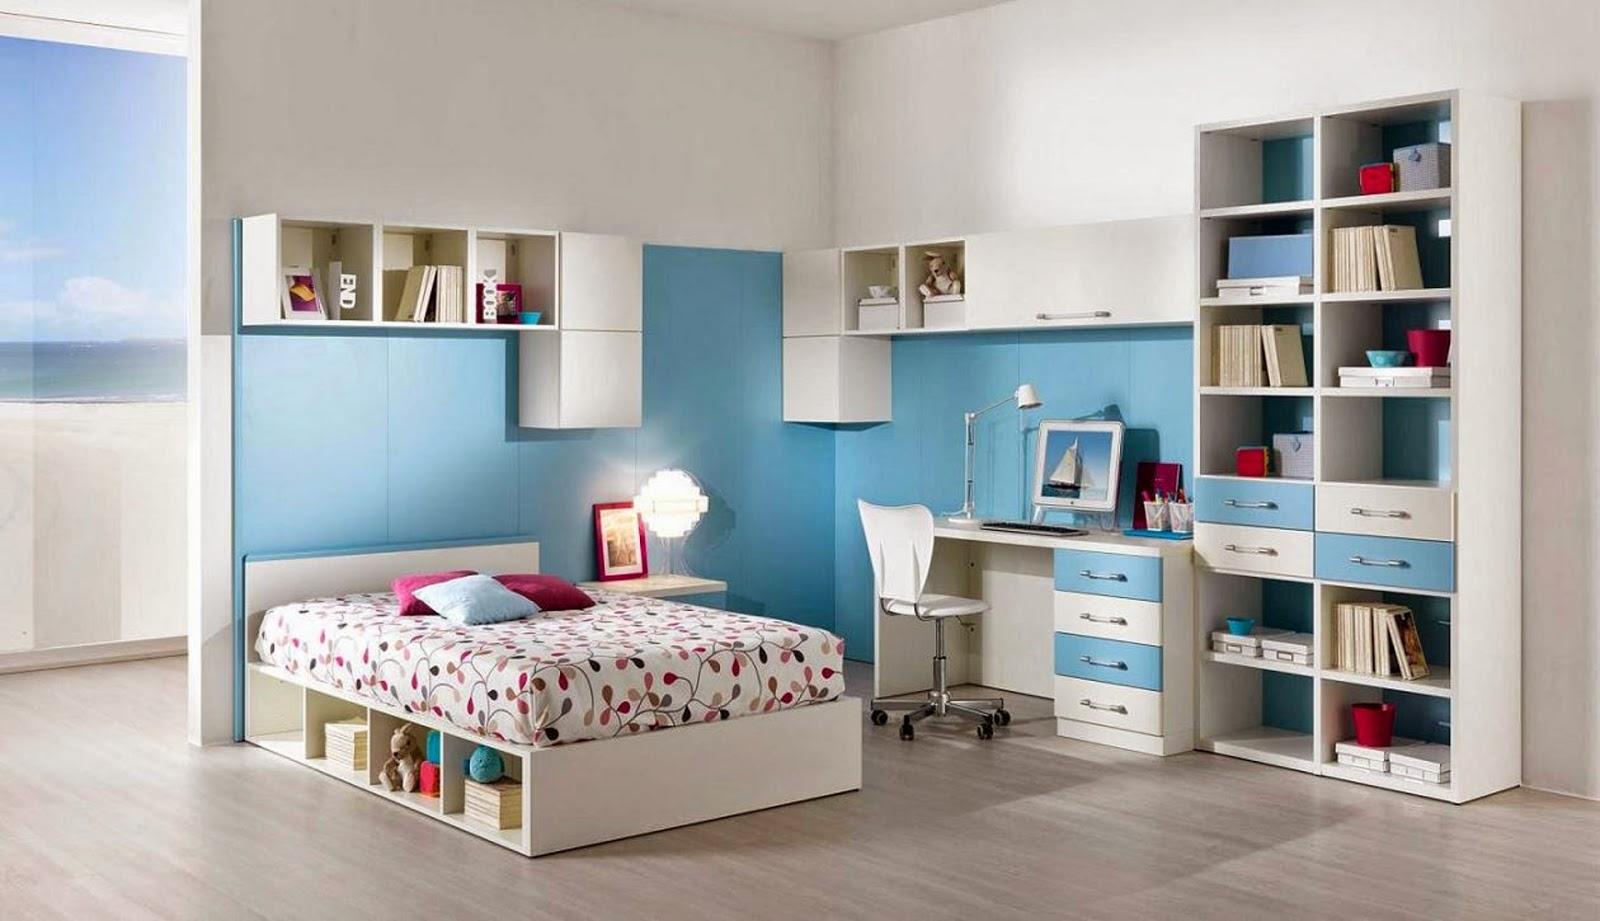 Chambre Ado Fille | Lit Double Pour Ado Best Ikea Chambre Ado ...